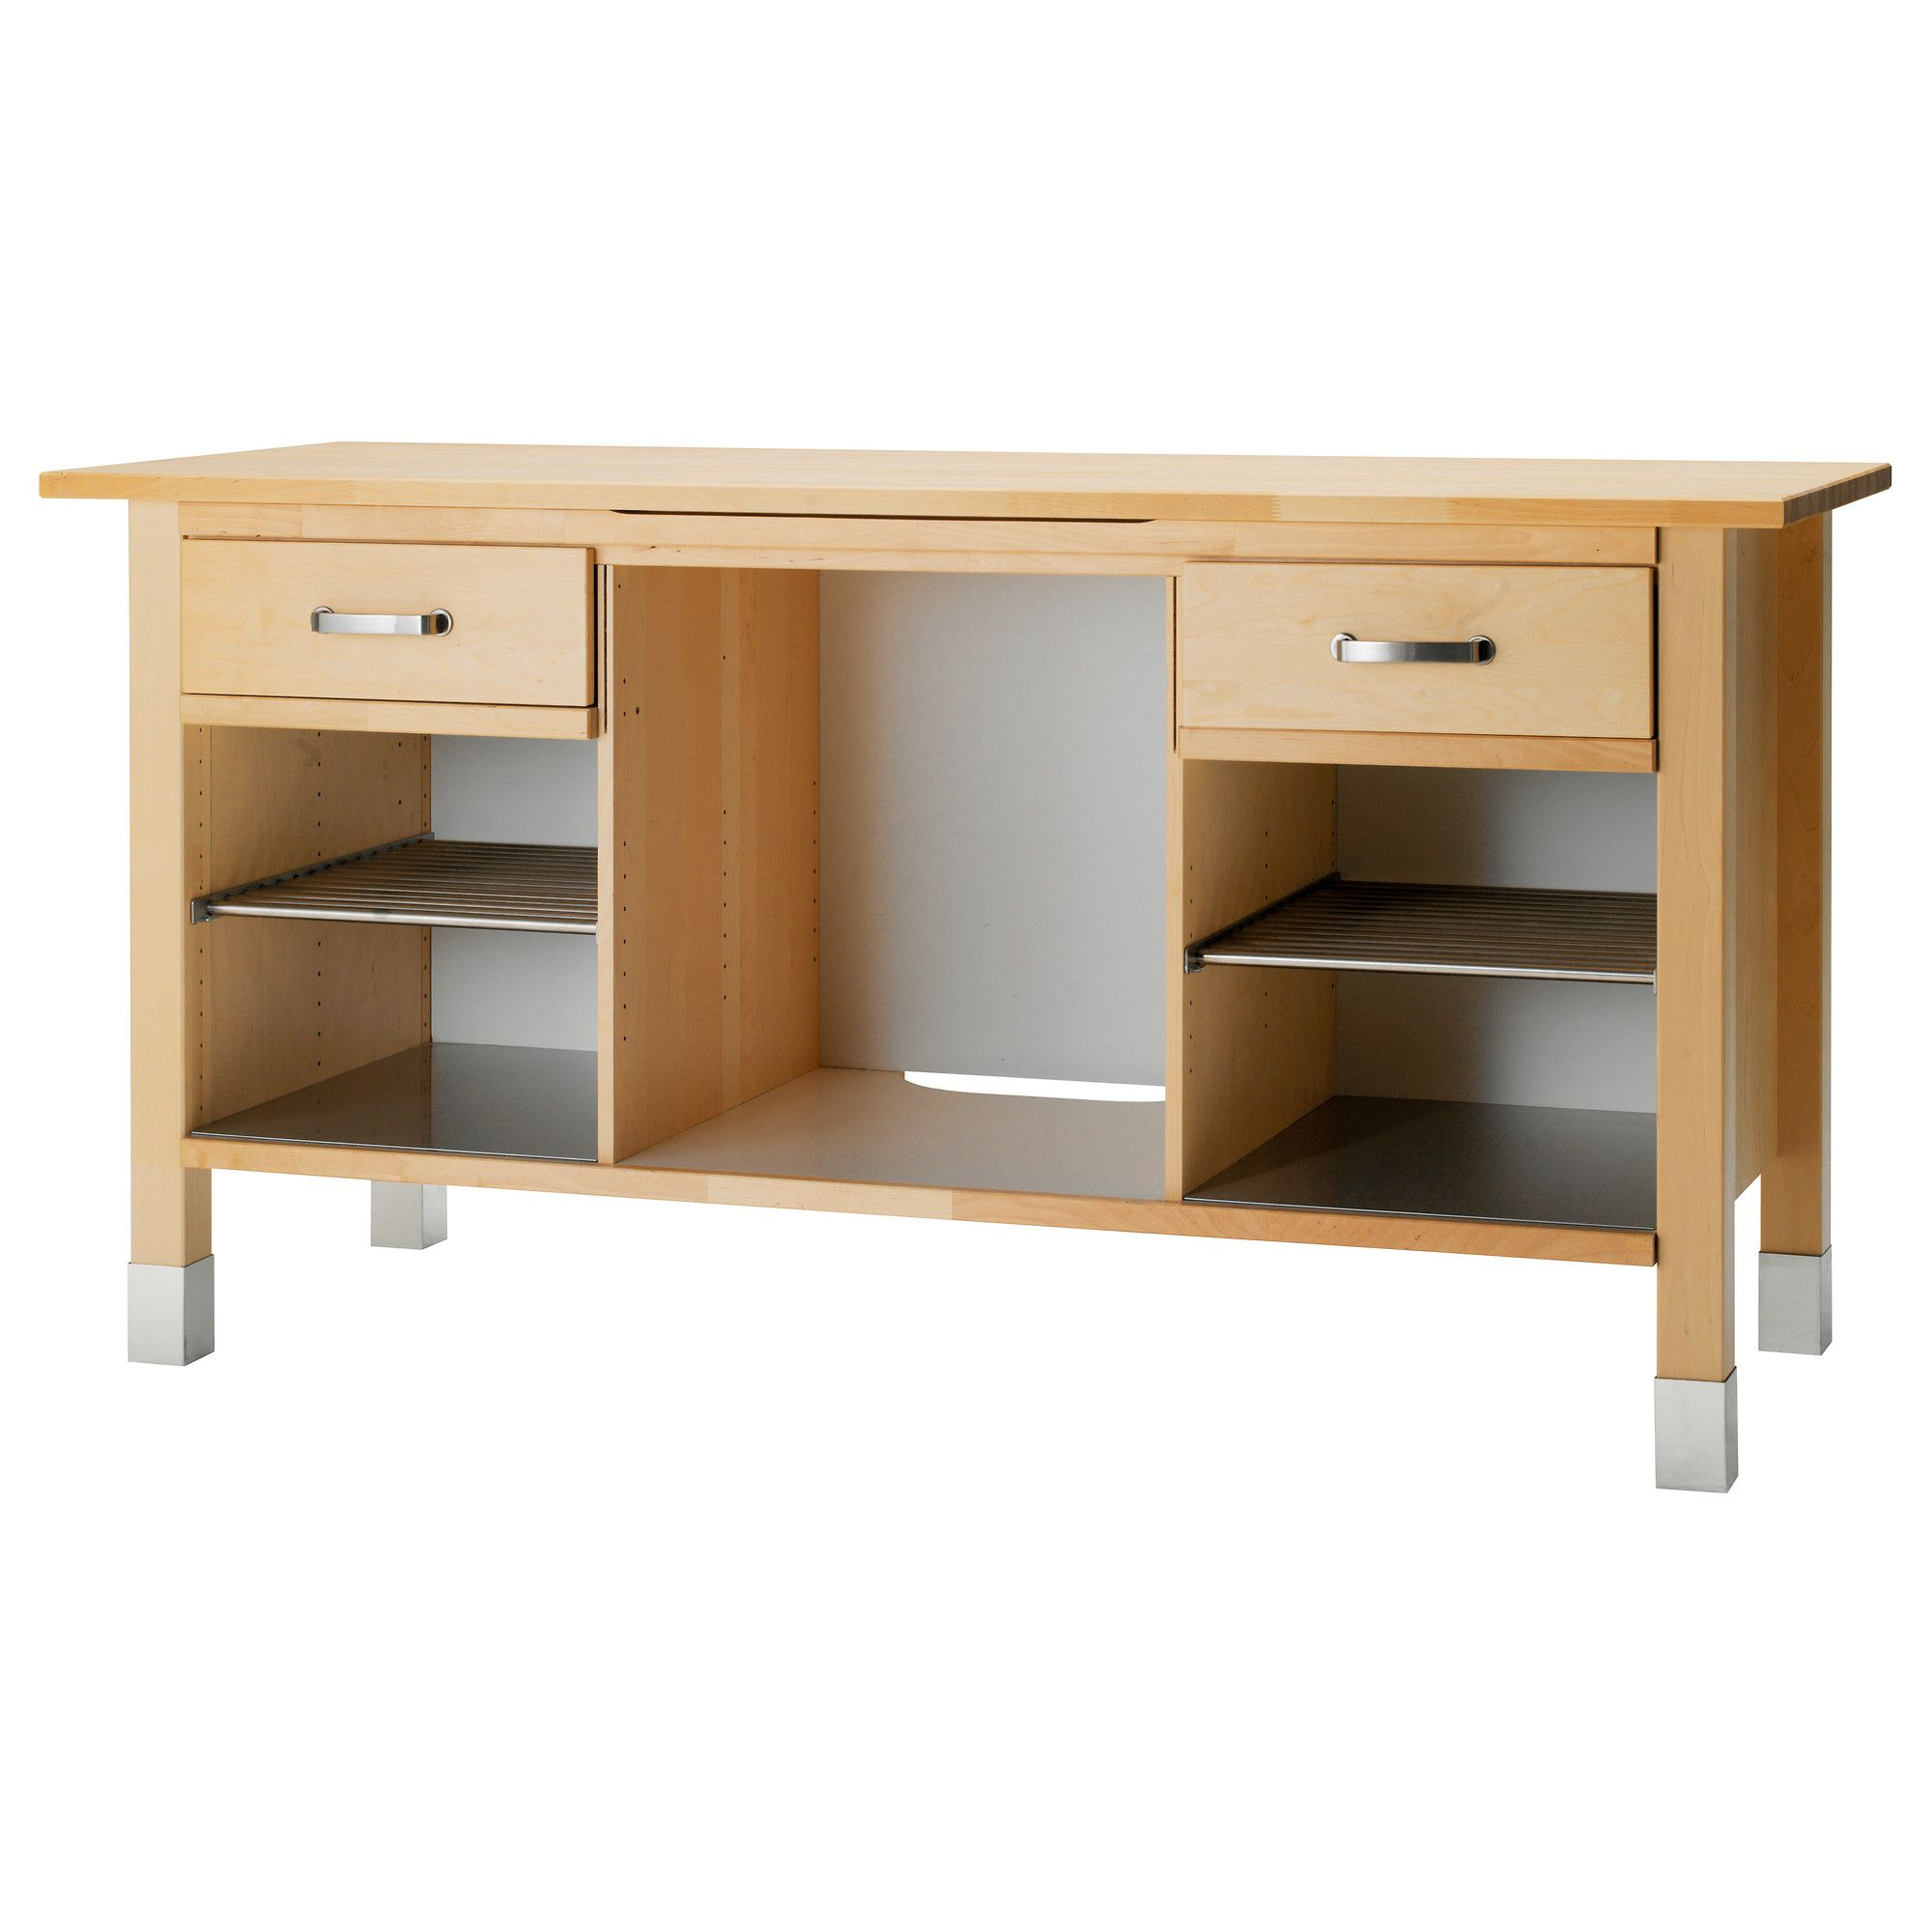 Full Size of Singleküche Ikea Värde Us Furniture And Home Furnishings Freestanding Kitchen Betten 160x200 Bei Küche Kaufen Miniküche Sofa Mit Schlaffunktion Modulküche Wohnzimmer Singleküche Ikea Värde